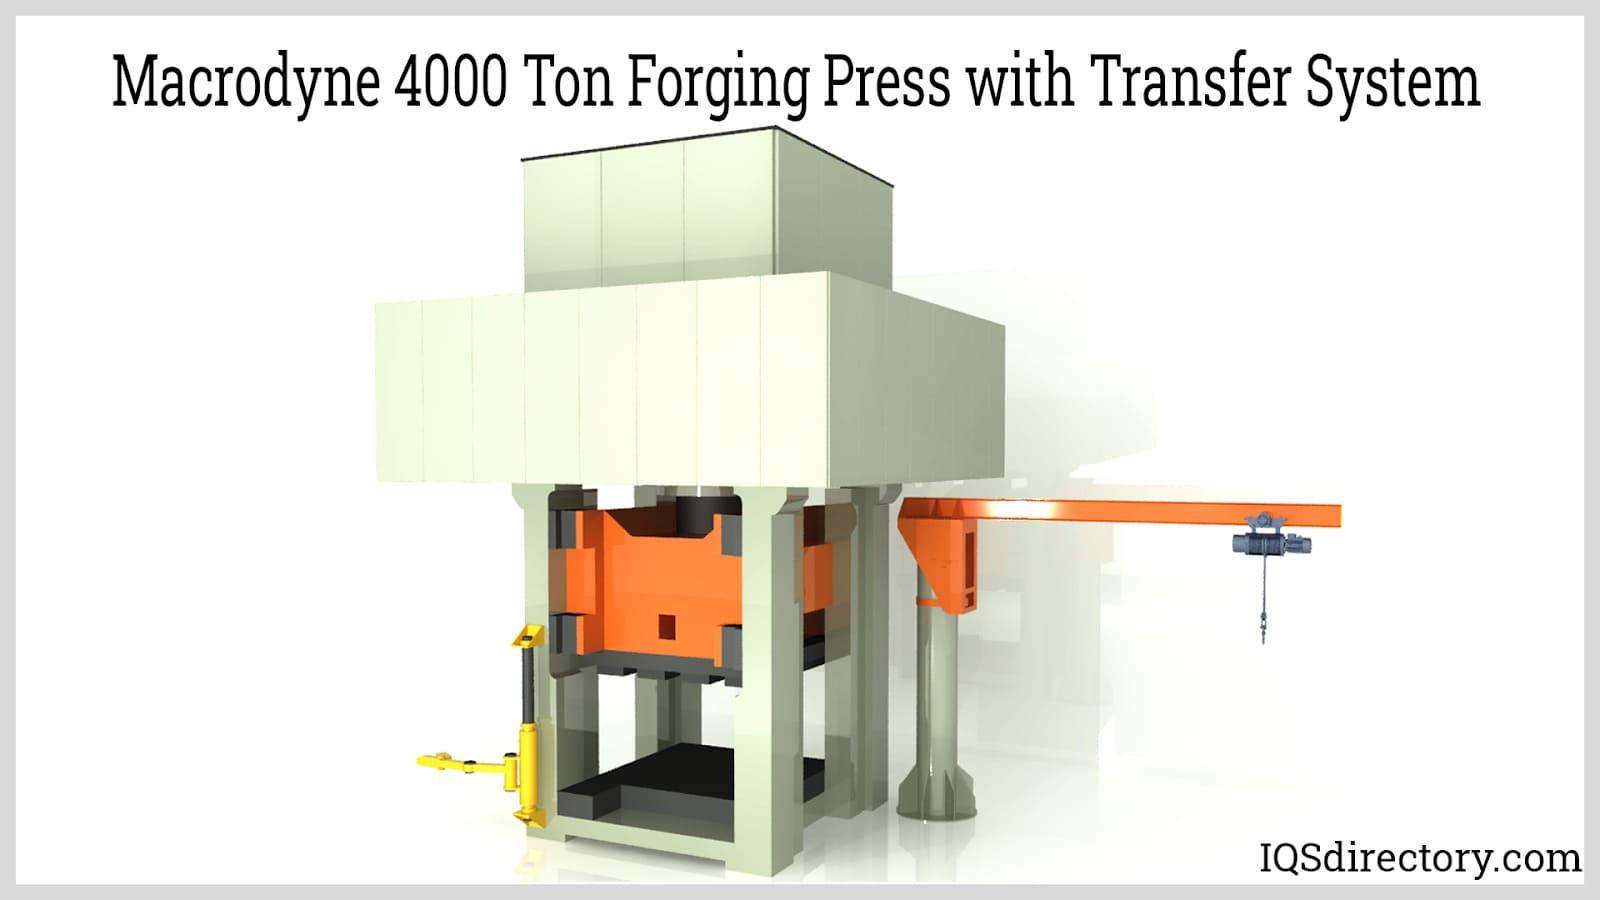 Macrodyne 4000 Ton Forging Press with Transfer System